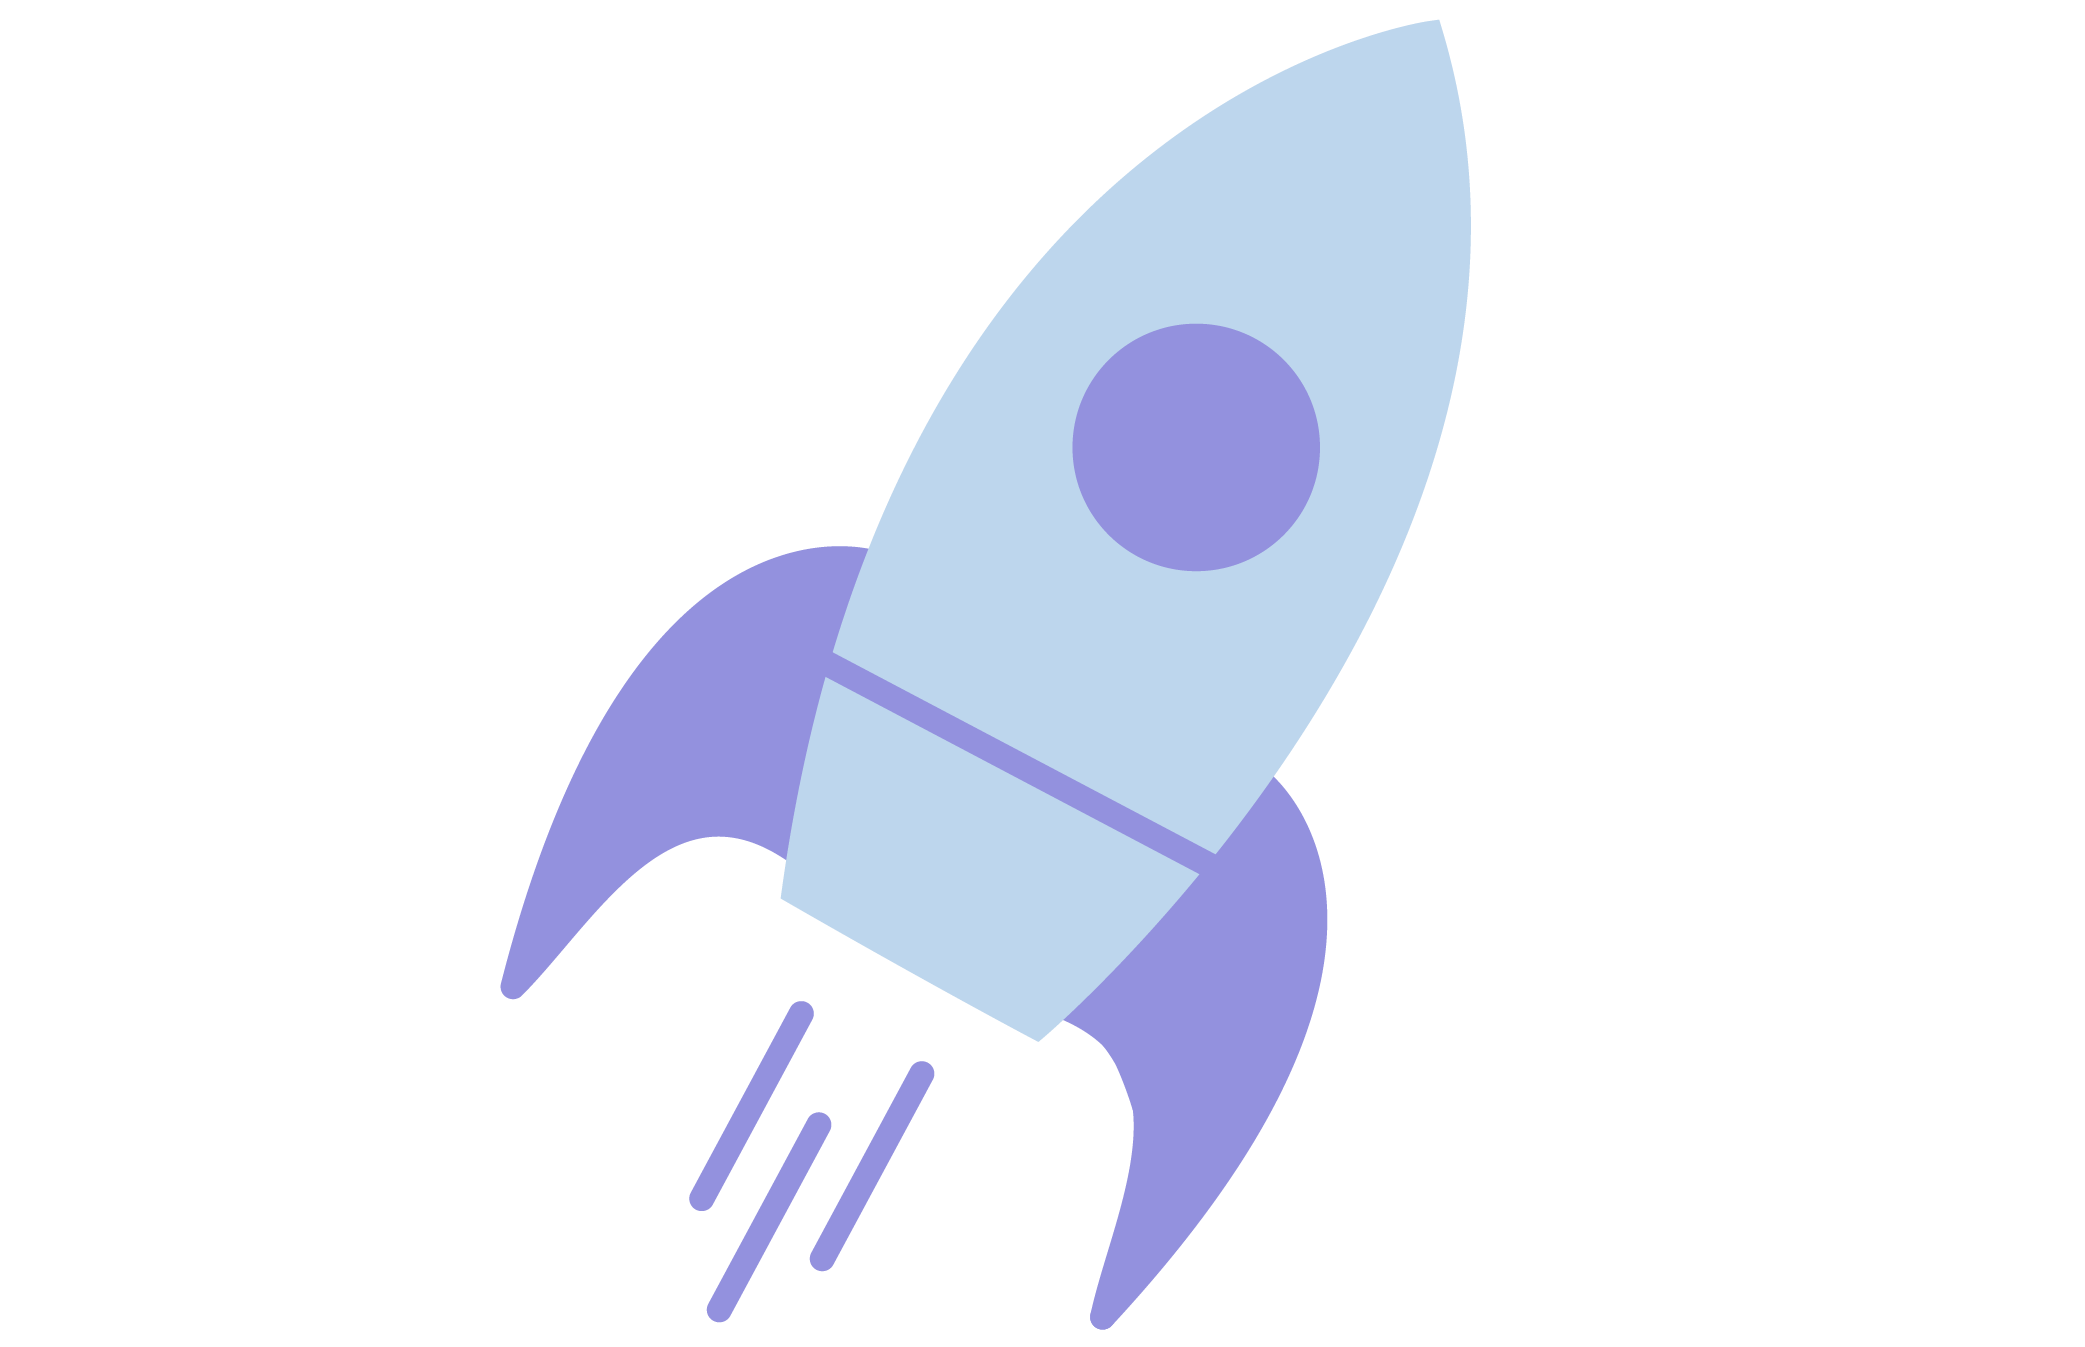 Purple rocket icon